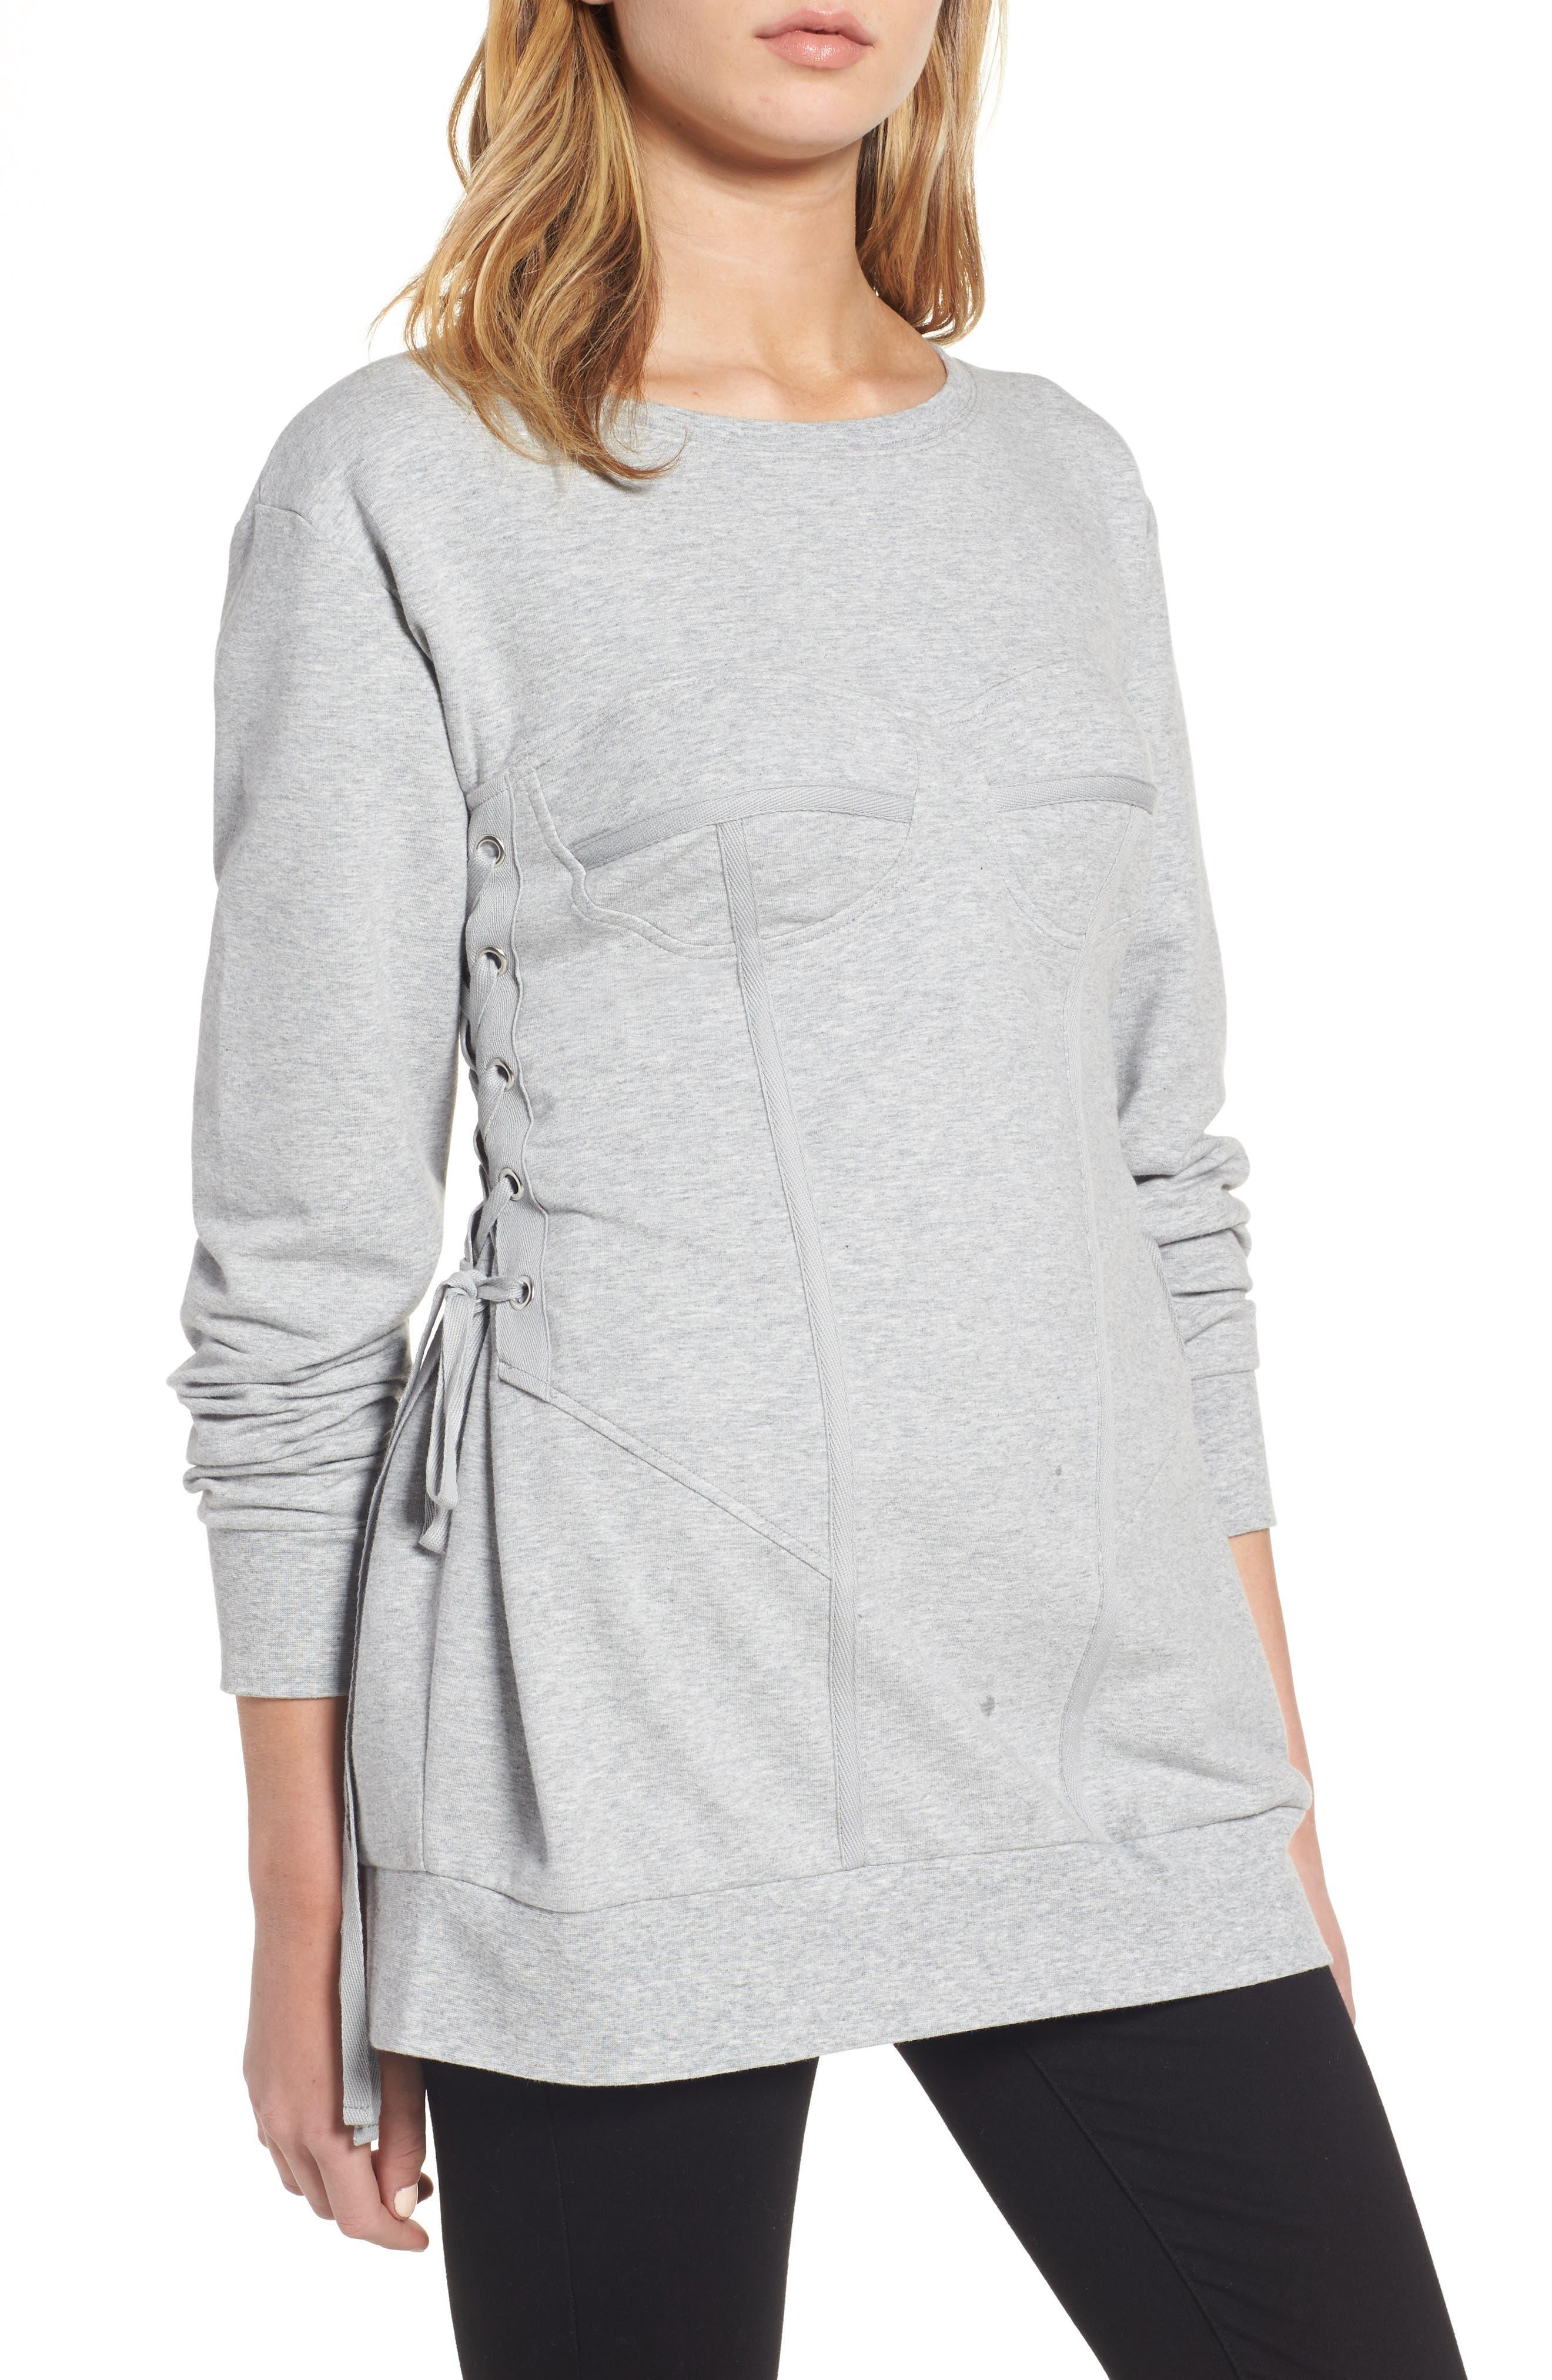 Corset Sweatshirt,                             Main thumbnail 1, color,                             Grey Heather